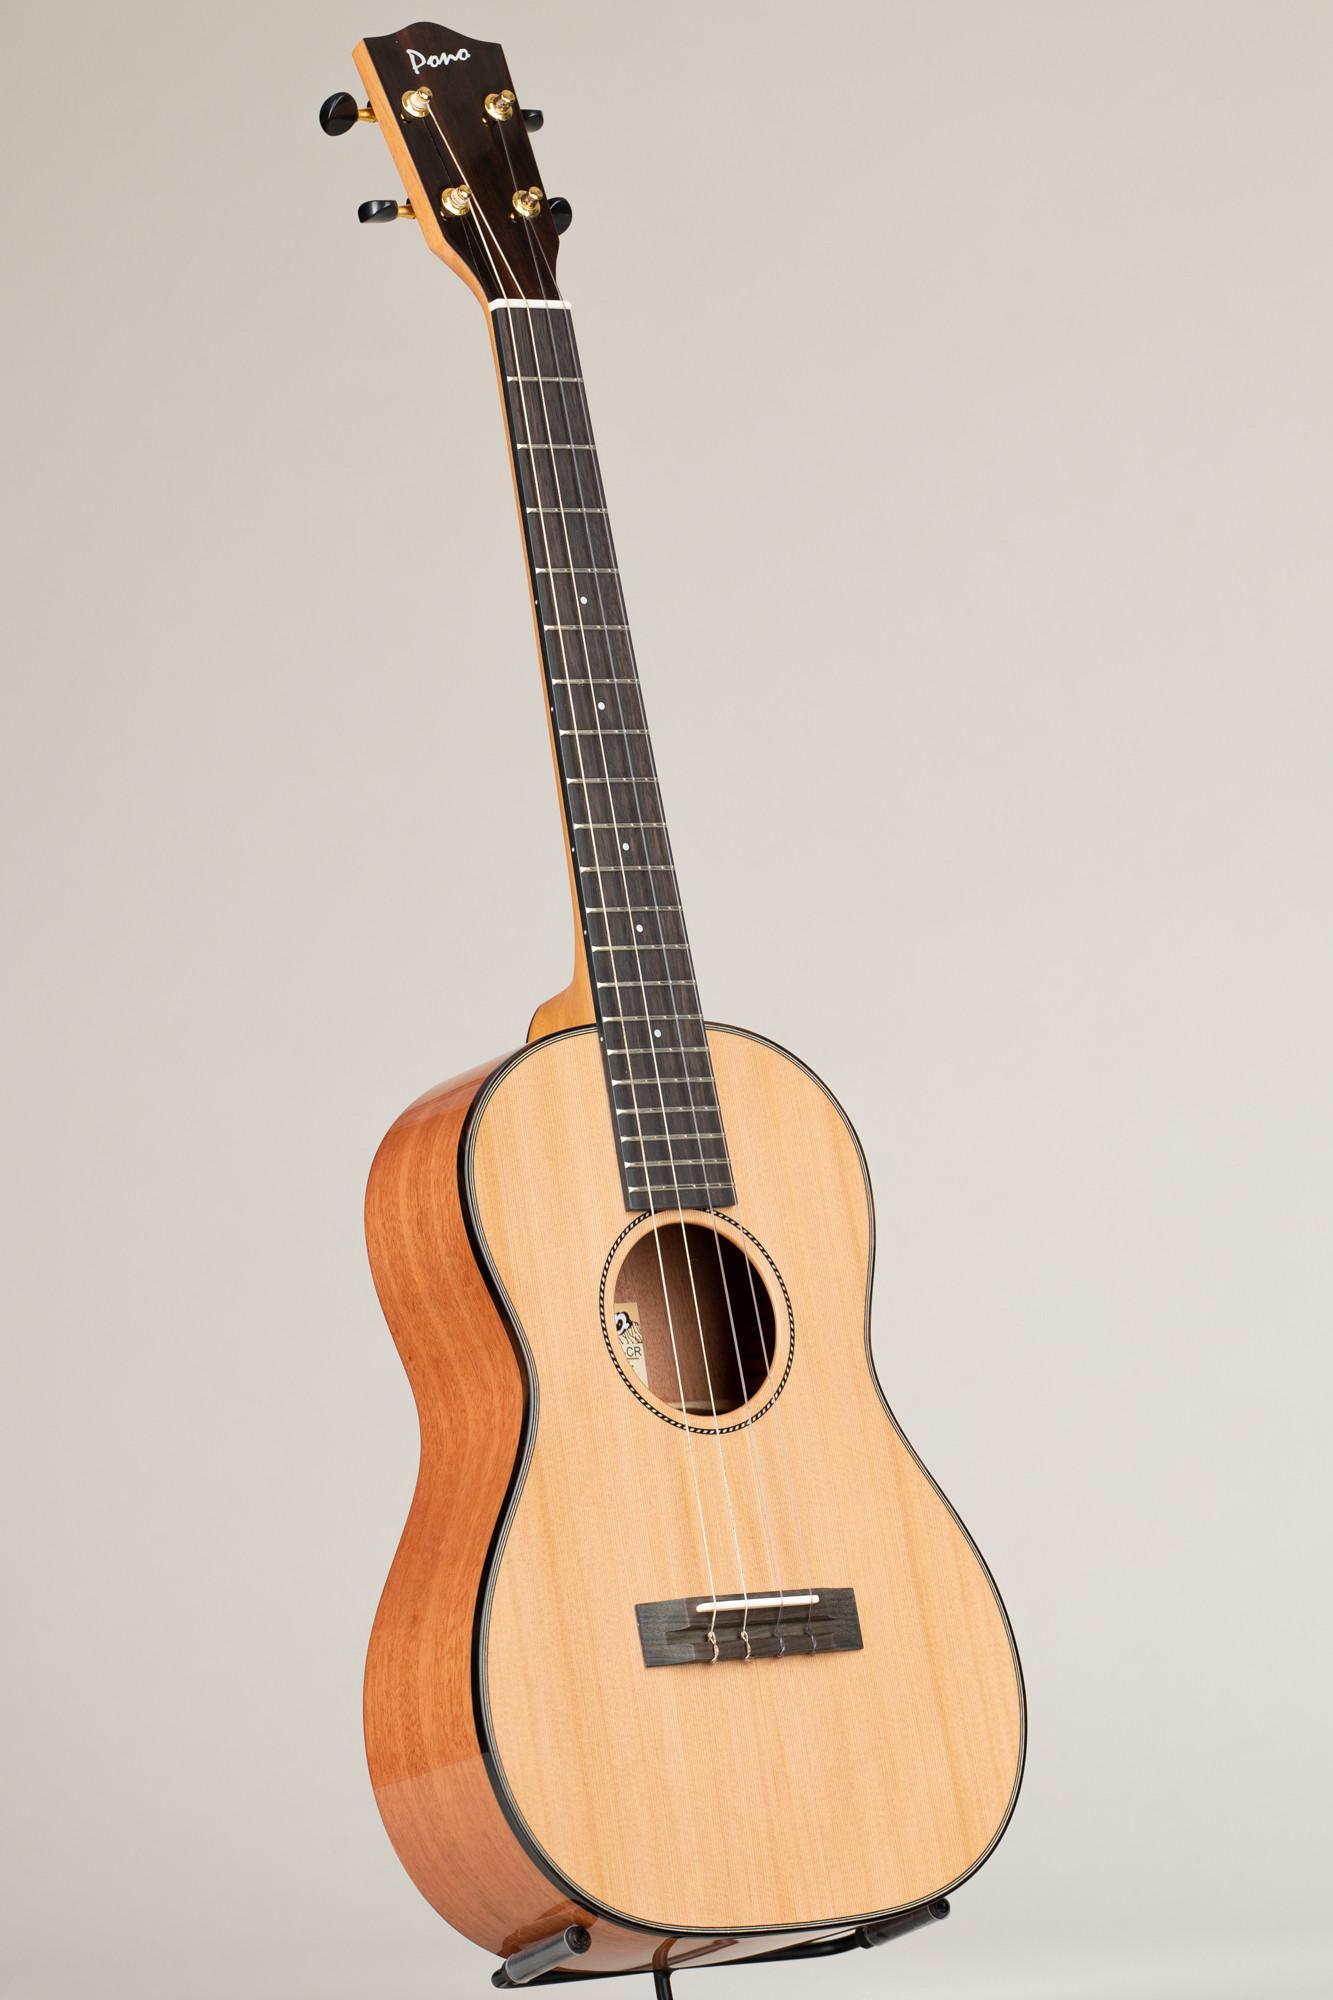 Pono Deluxe Cedar /Mahogany Baritone (MBD-CR 4714)